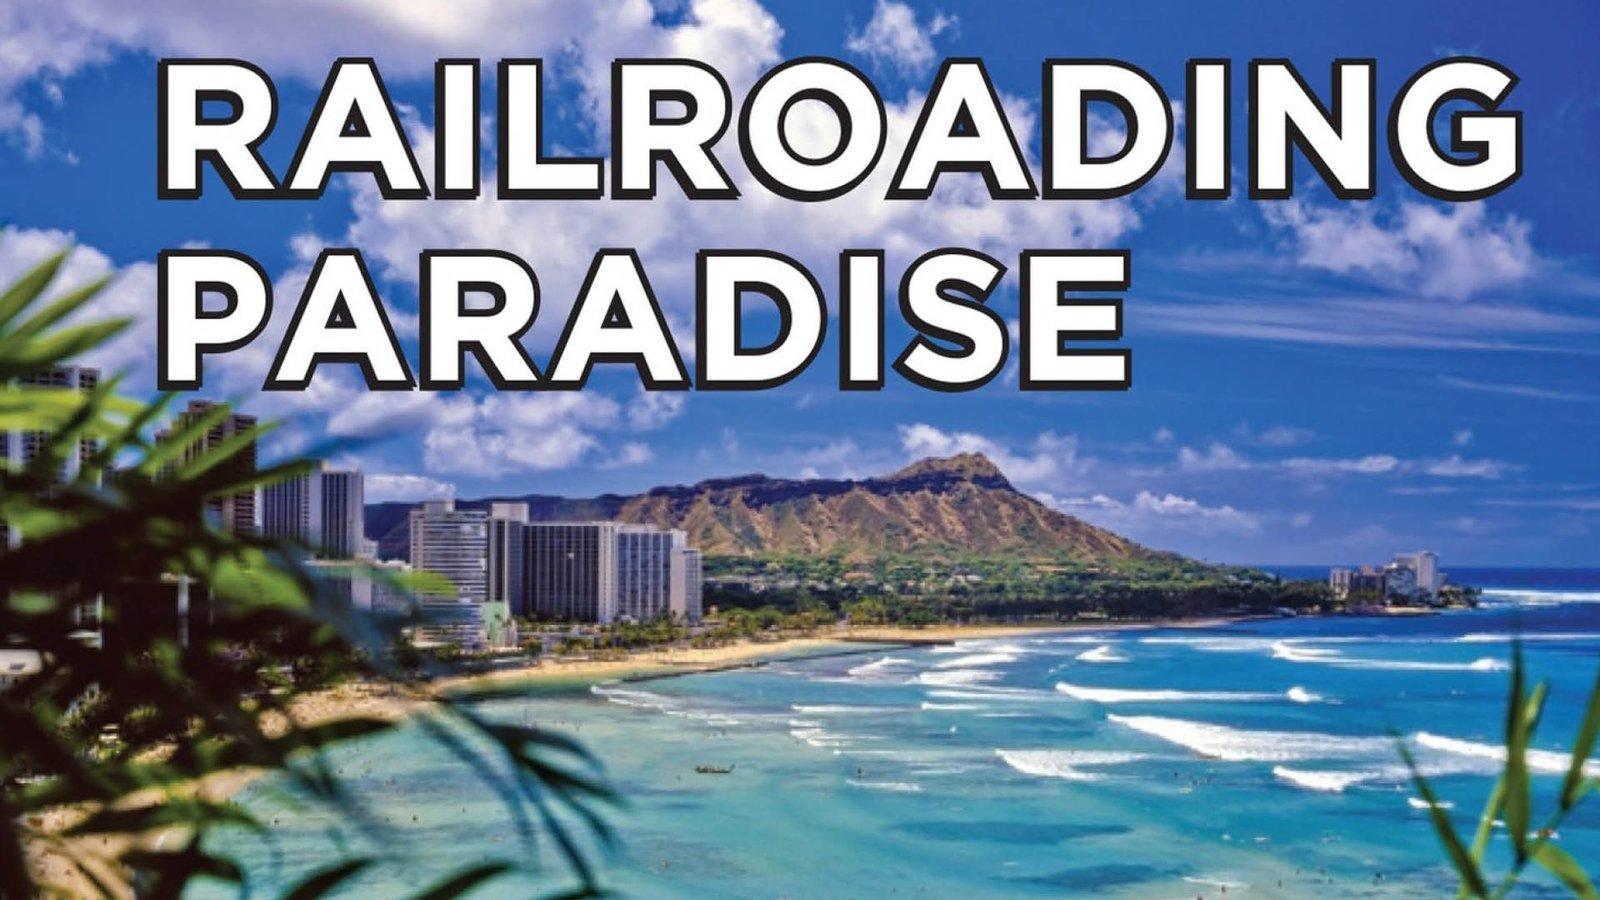 Railroading Paradise - Environmental Preservation vs. New Housing in Hawaii